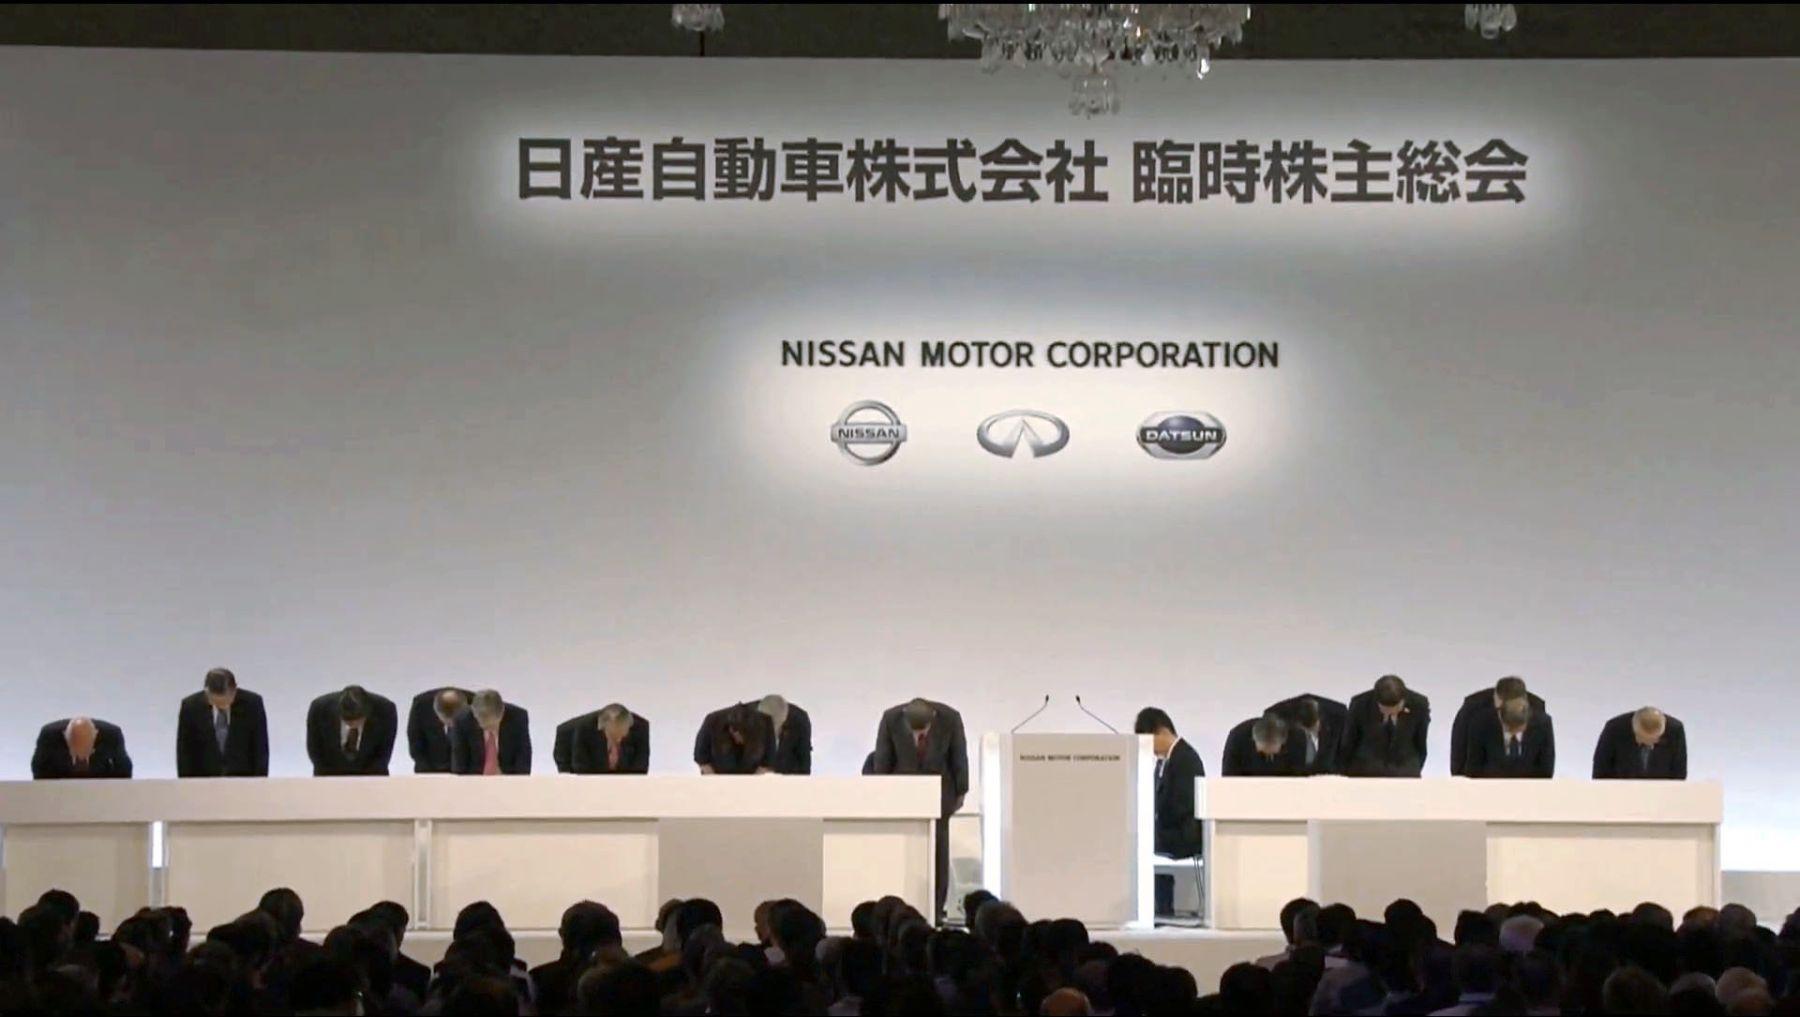 Japan Ghosn Video & Nissan 012